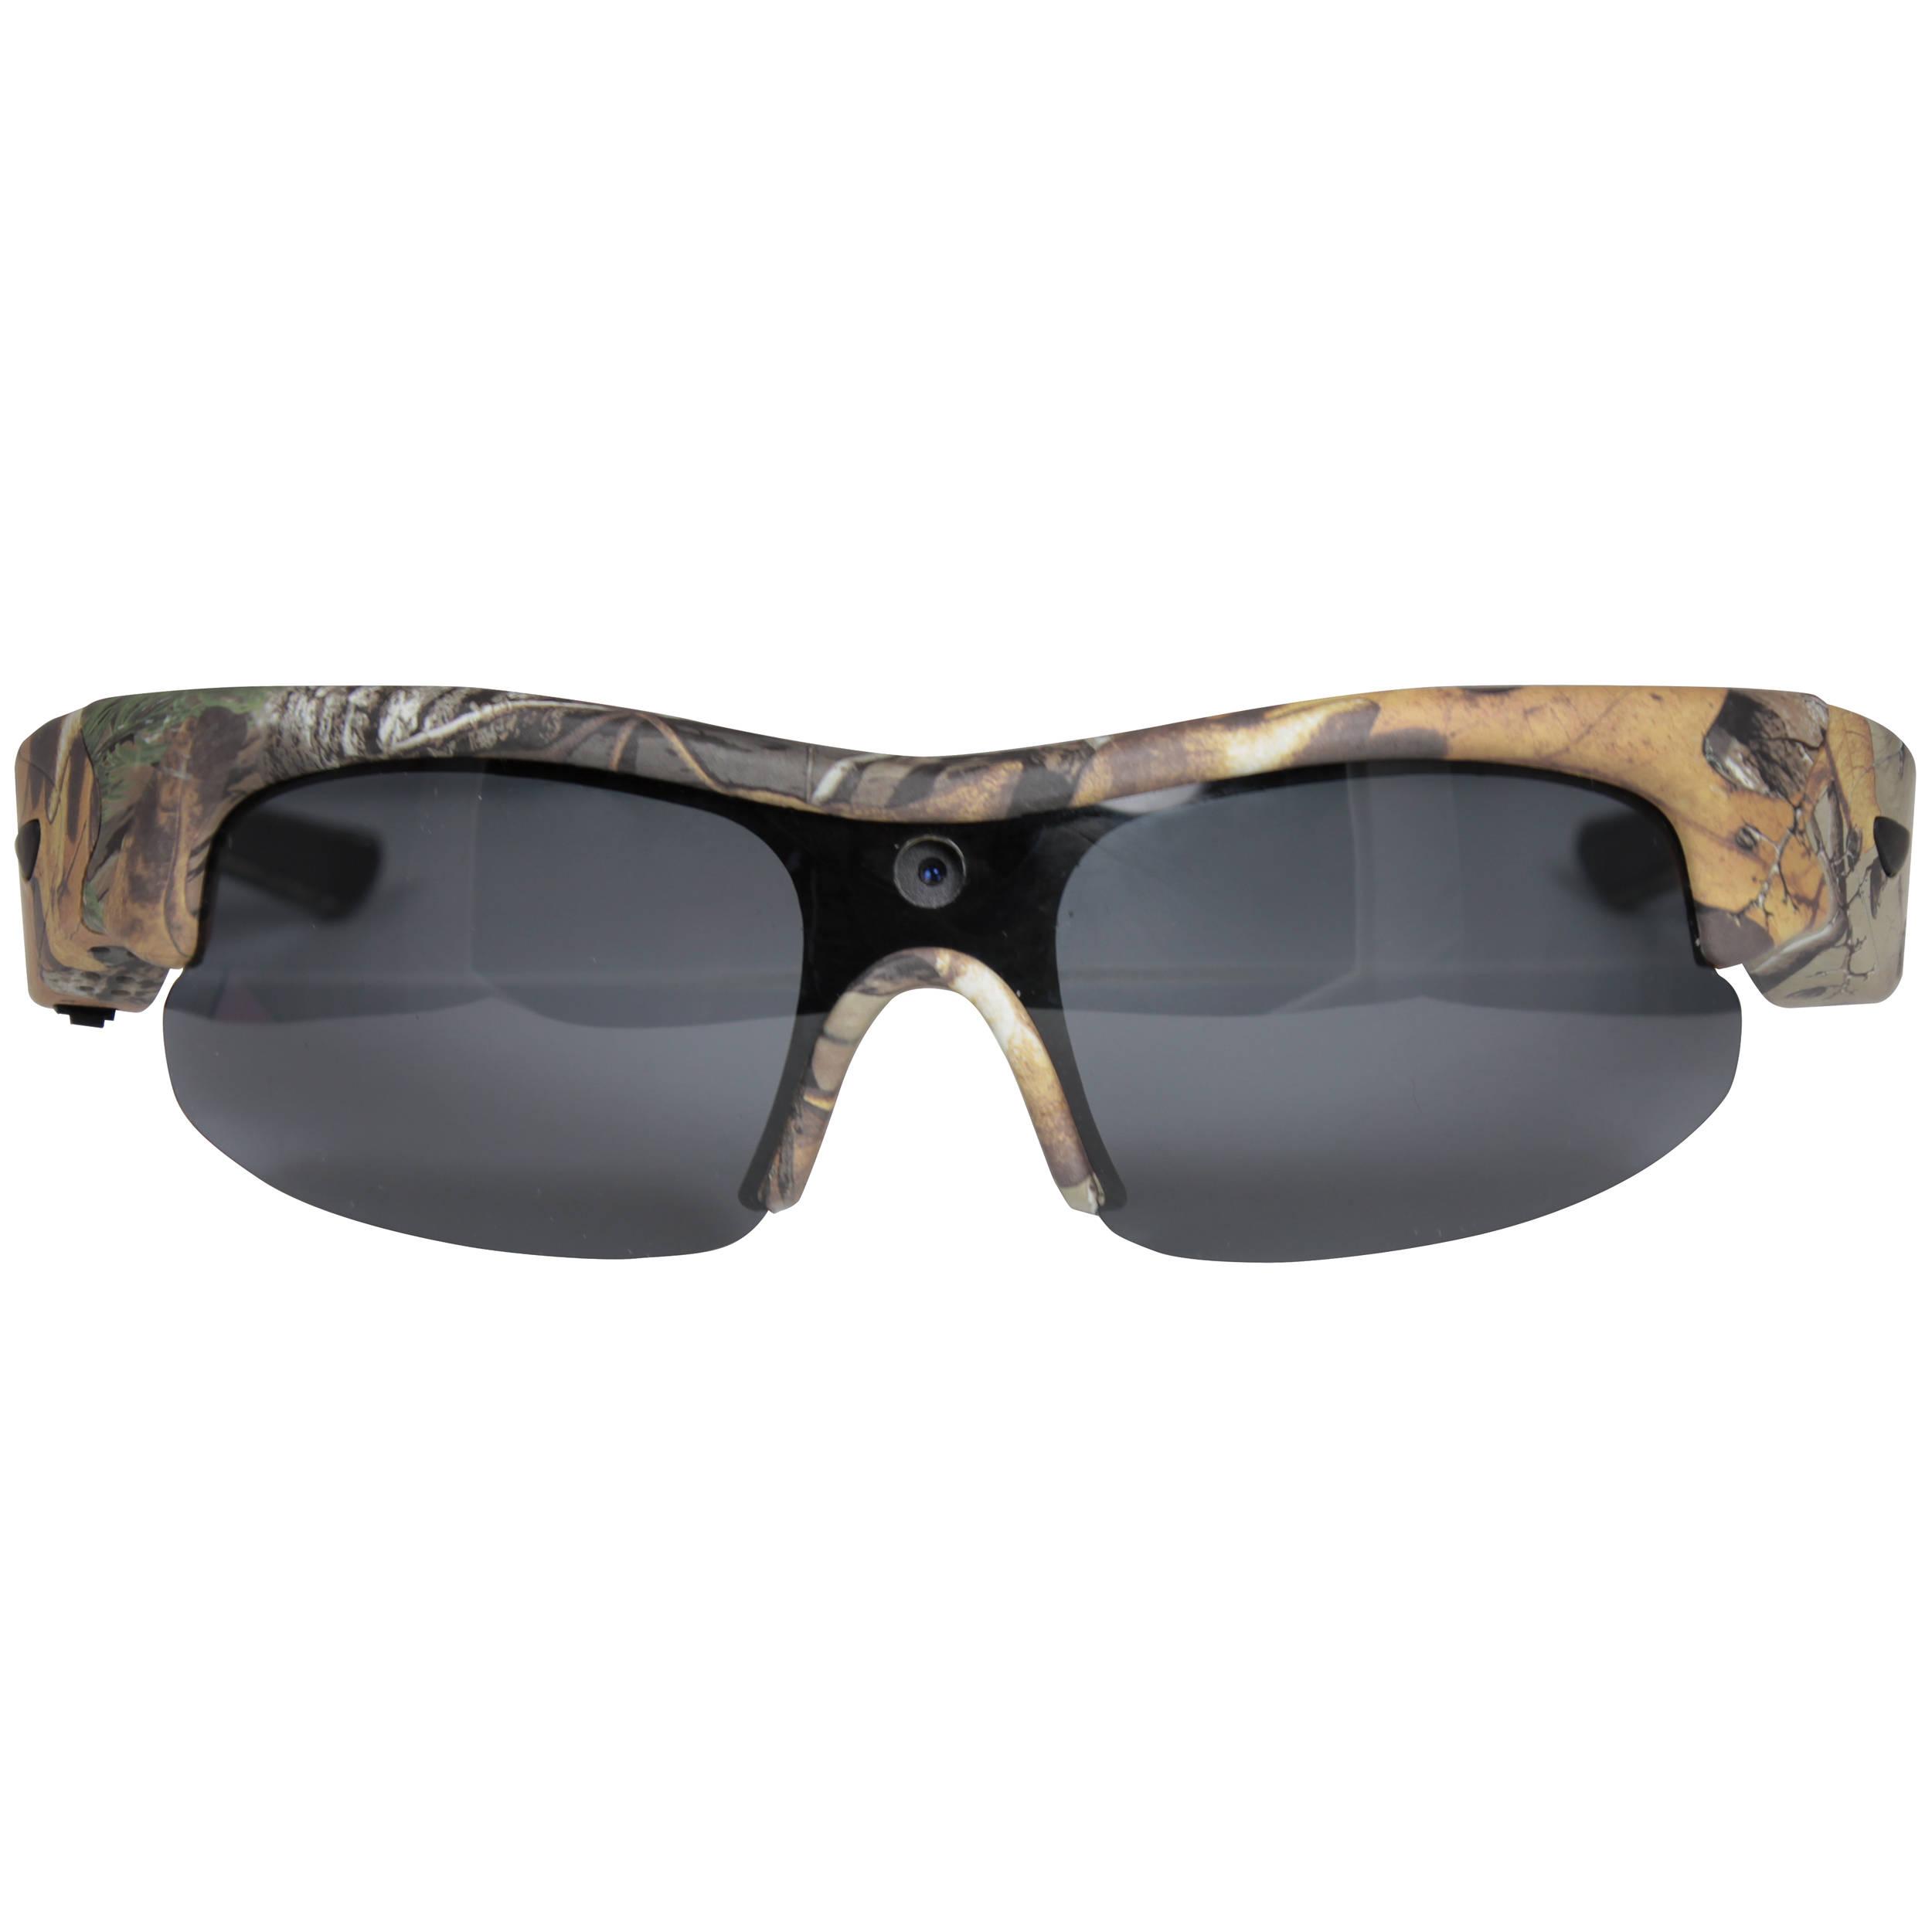 Moultrie HD Video Camera Glasses MCG-13039 B&H Photo Video